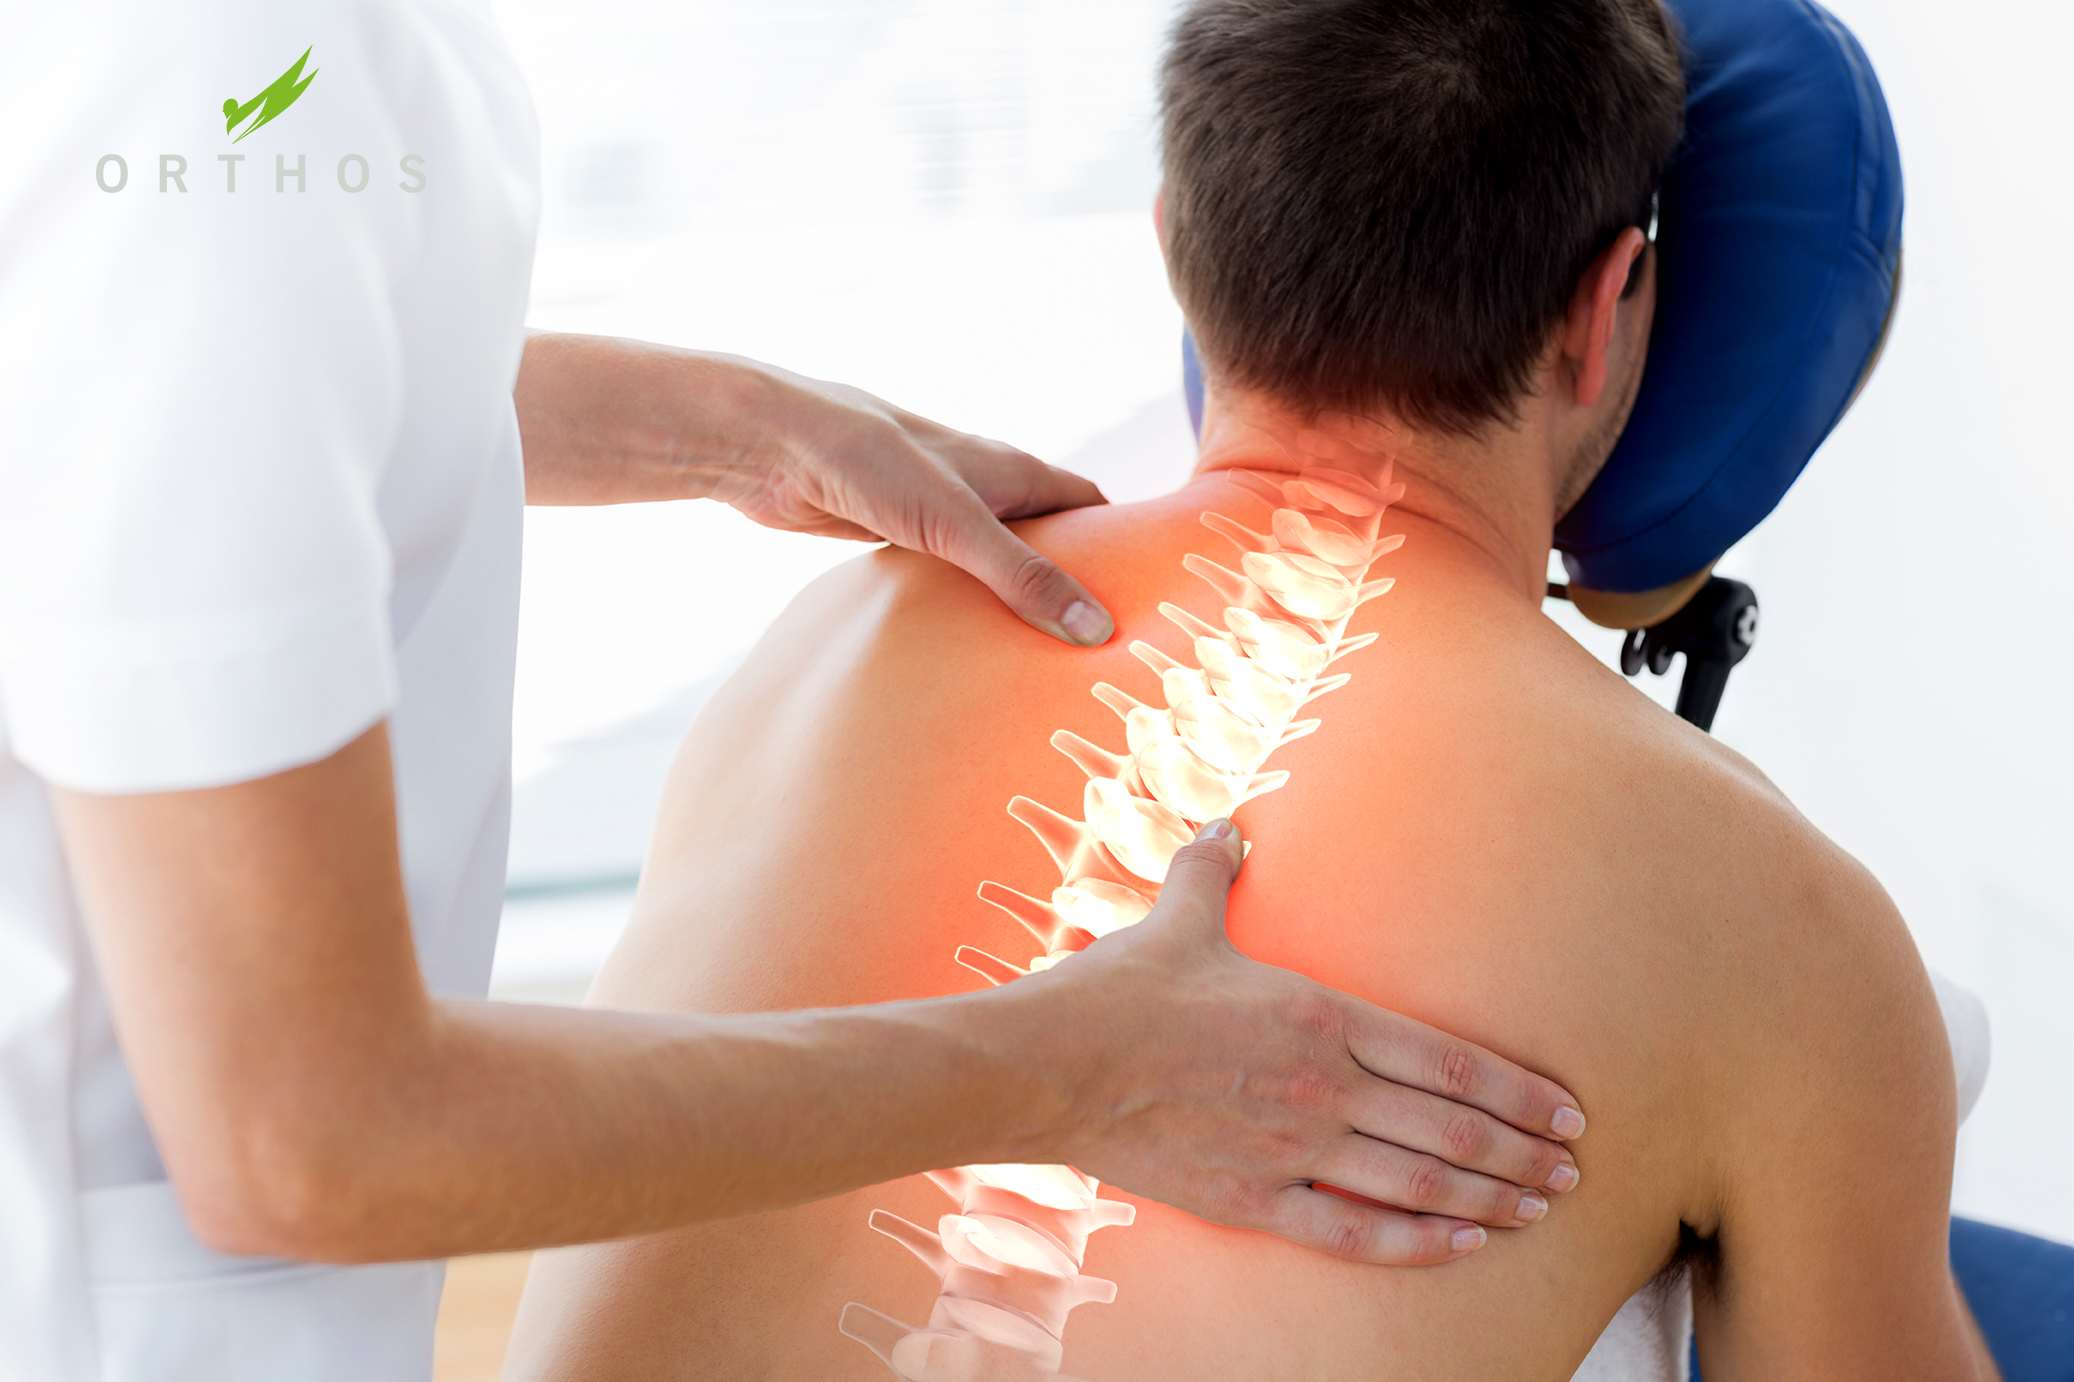 curso intensivo quiromasaje y masaje deportivo - ORTHOS - Santi Jacomet